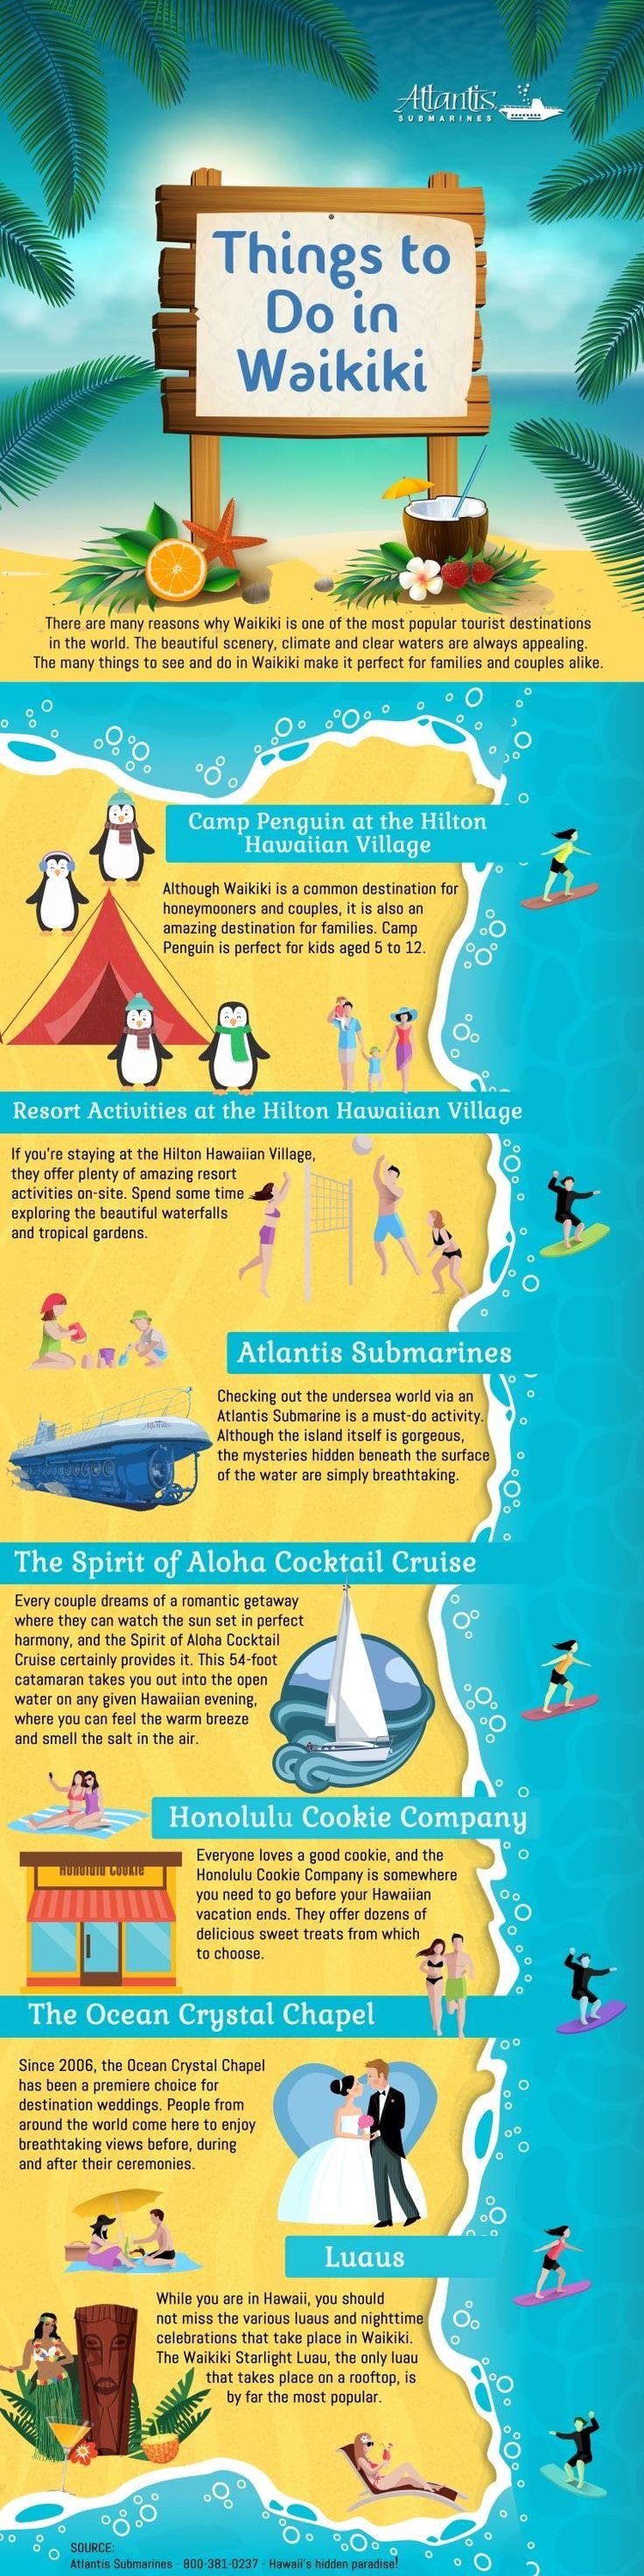 http://www.atlantisadventures.com/waikiki This infographic lists 7 top ideas what to do in Waikiki, Hawaii.